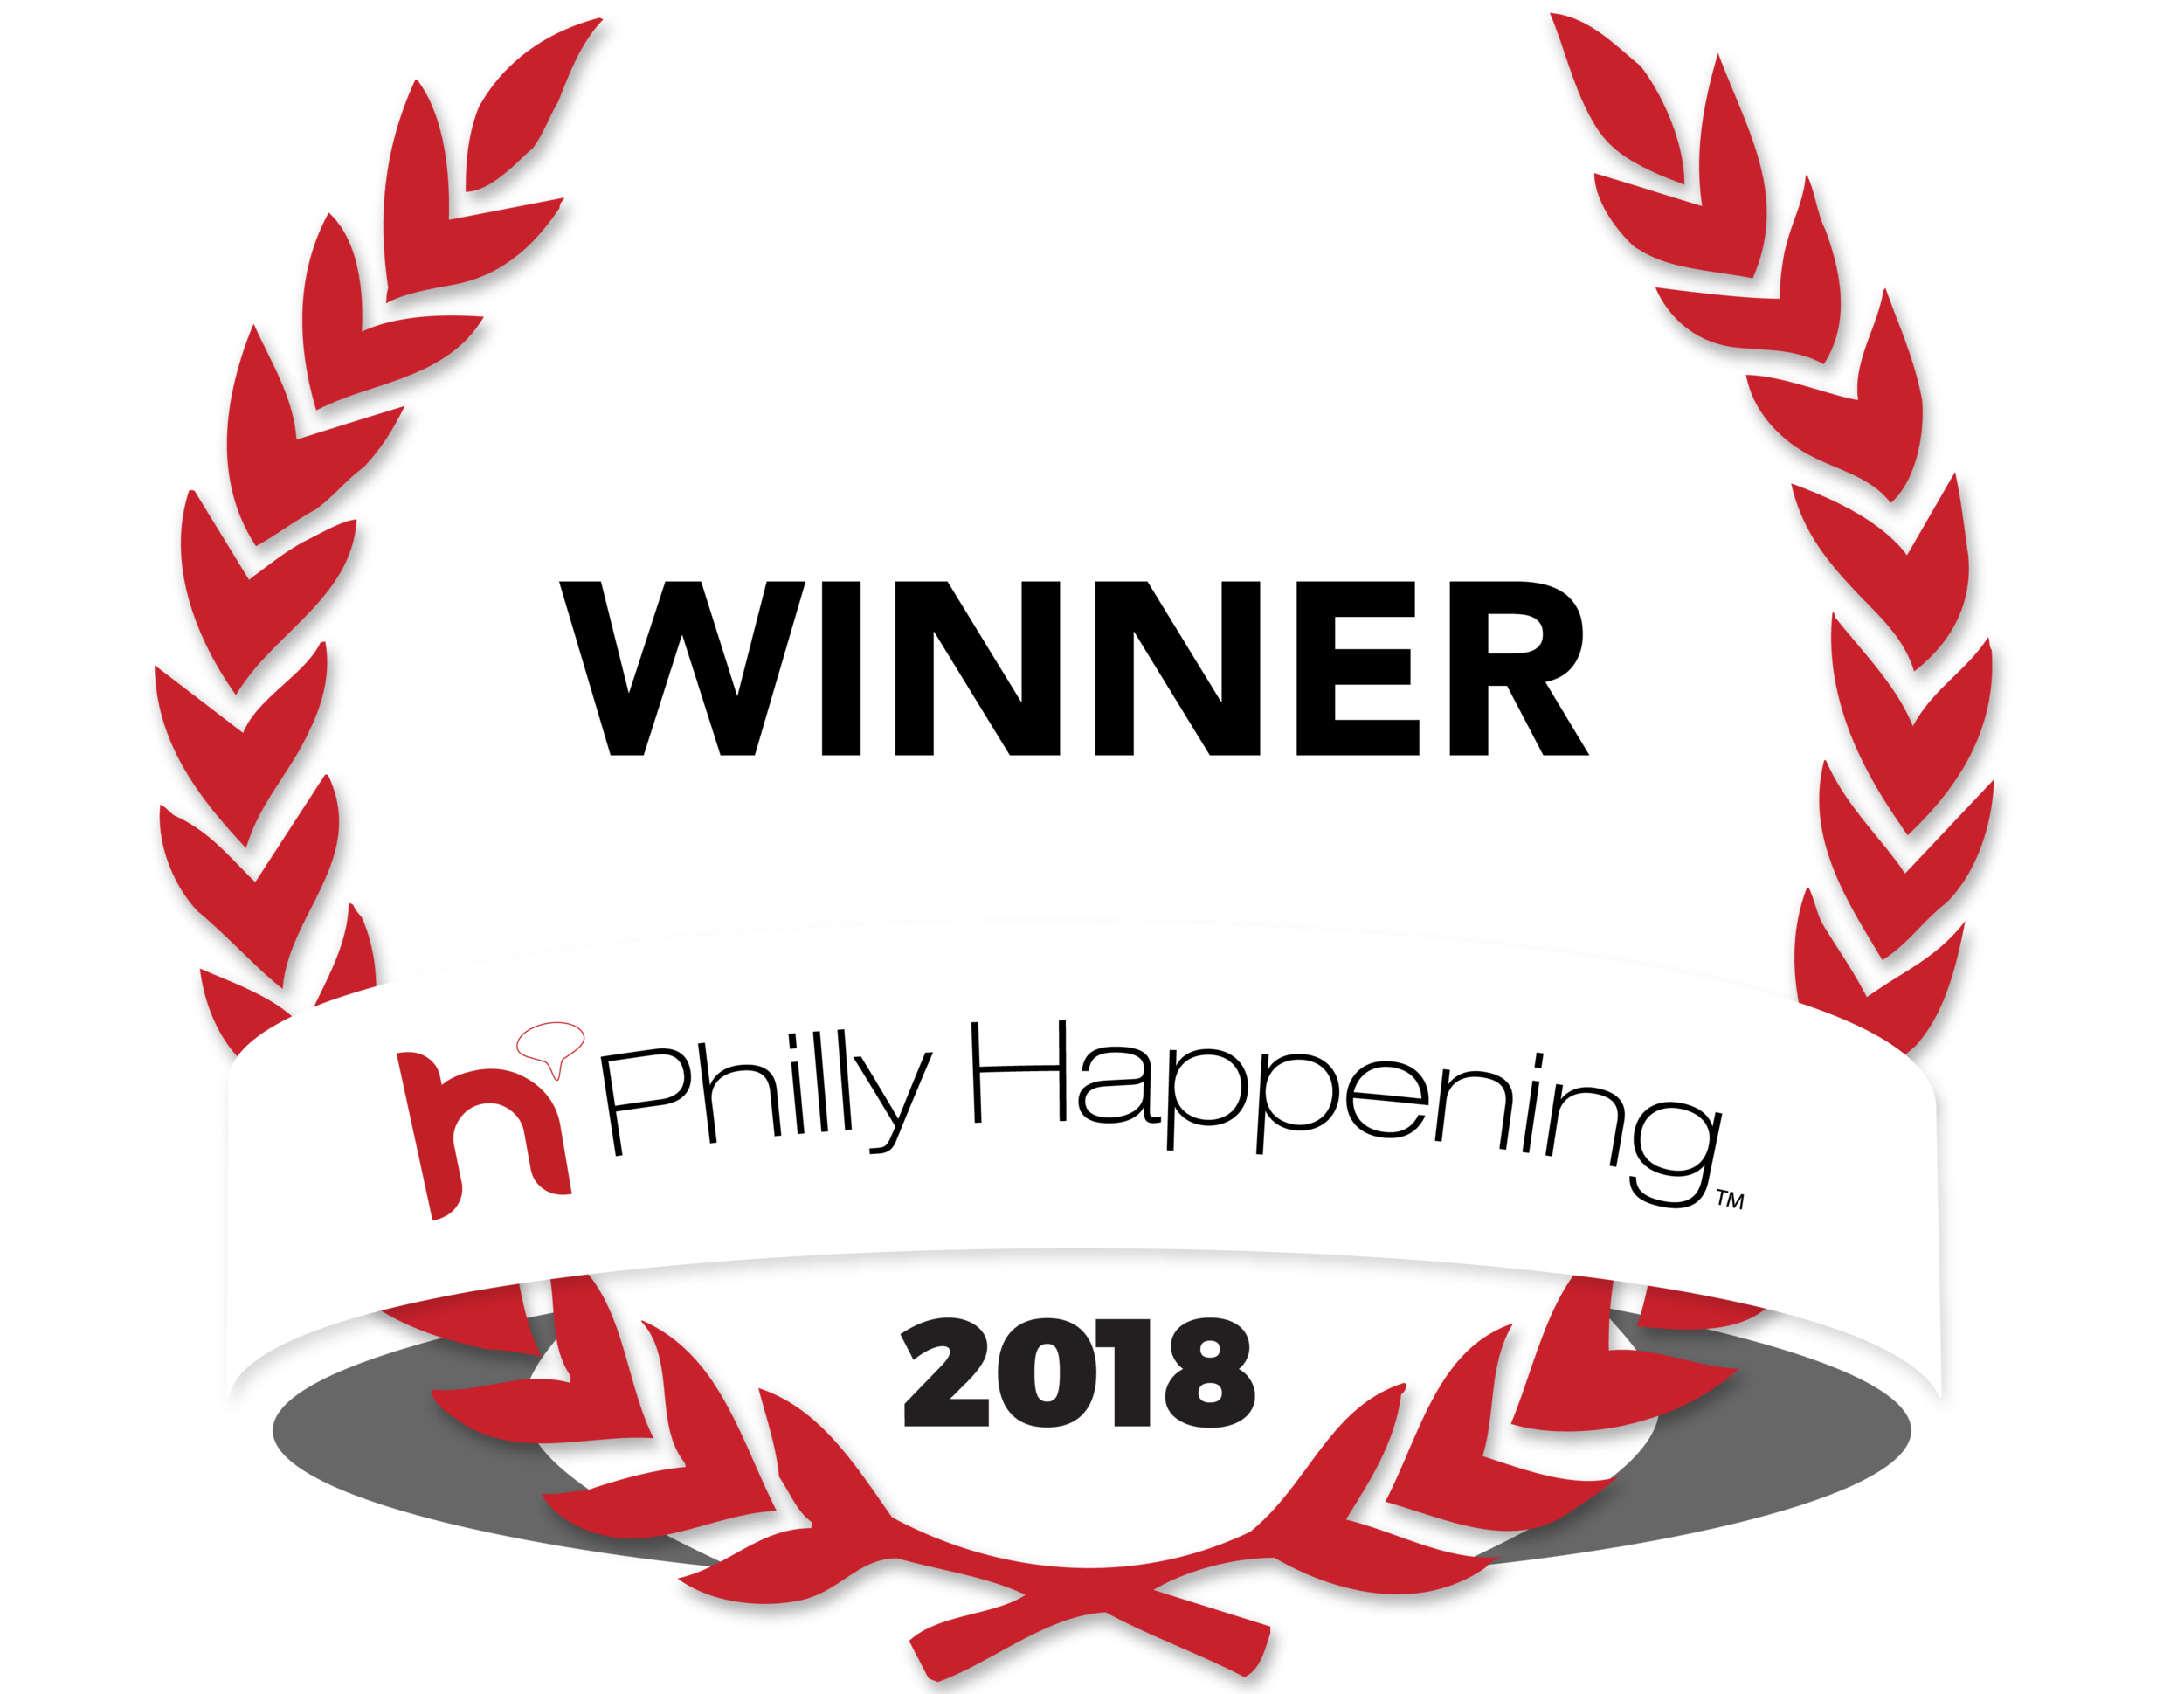 Philly-Happening-HL-Badge-2018--WINNER.png